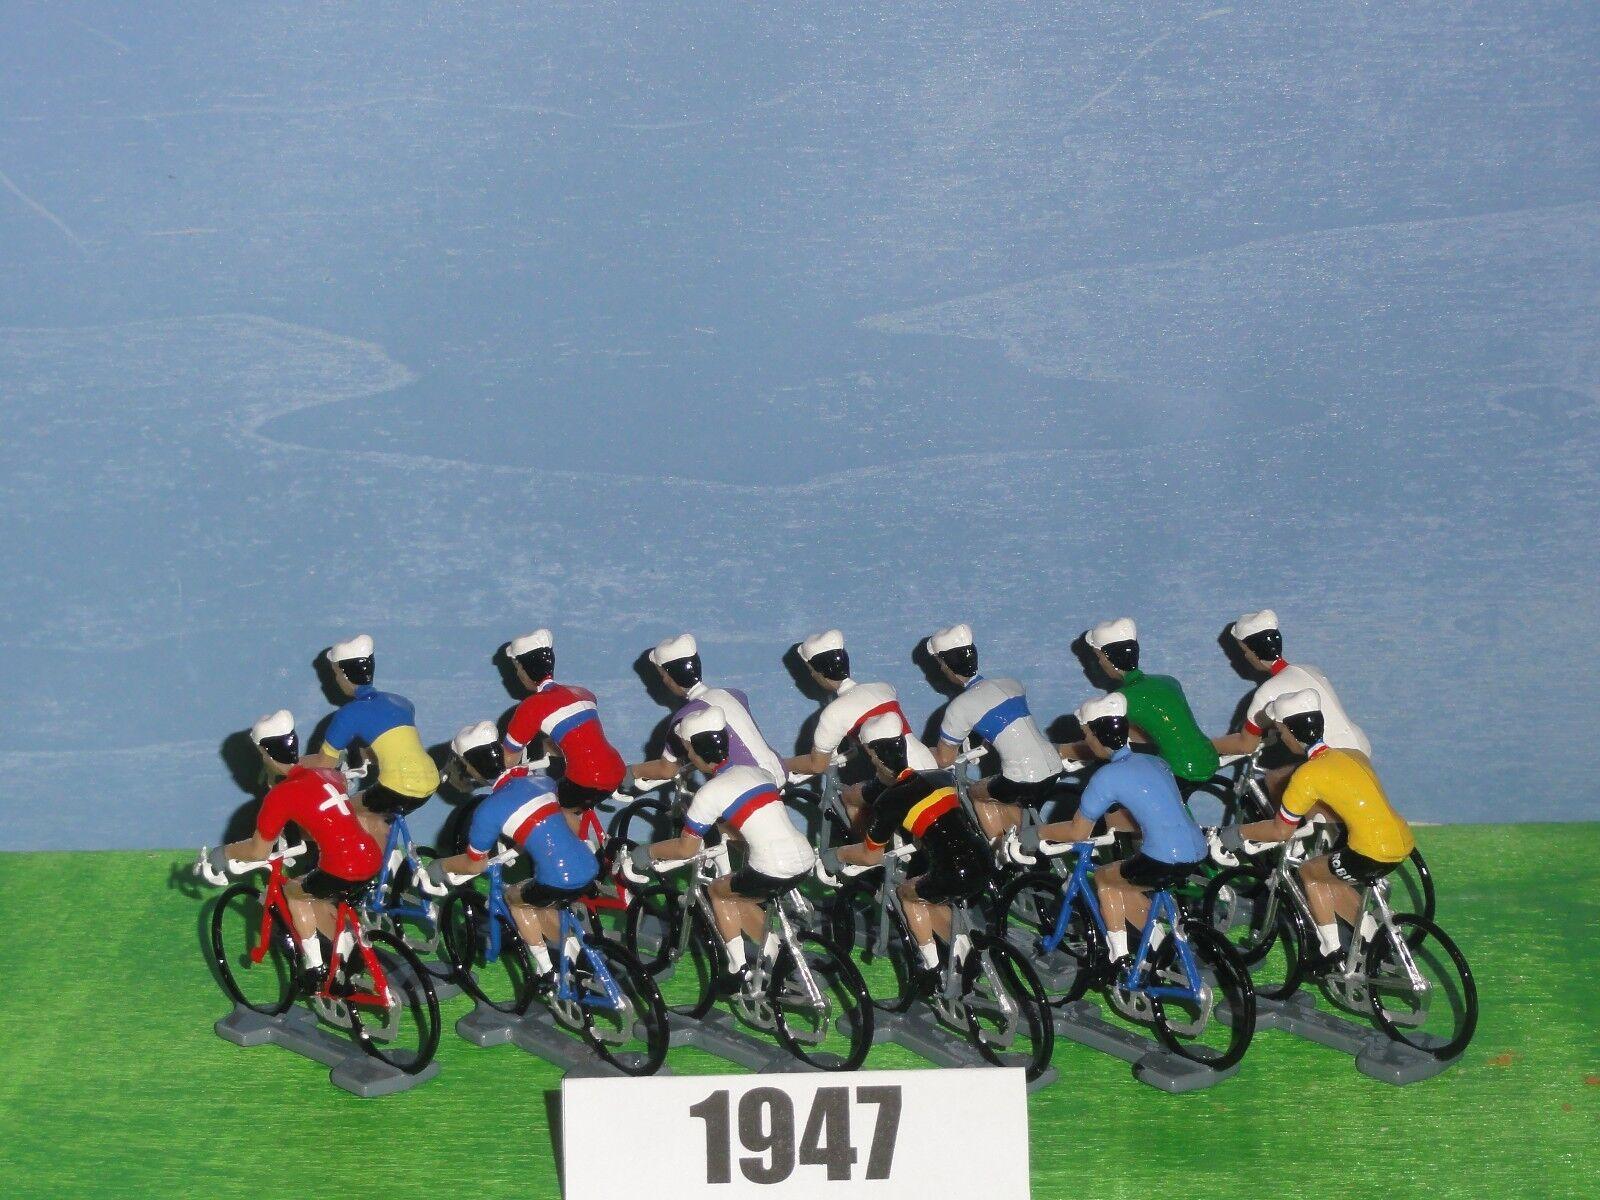 Figurine cyclist-exoletus figure-tdf 1947 complete (13) figurines